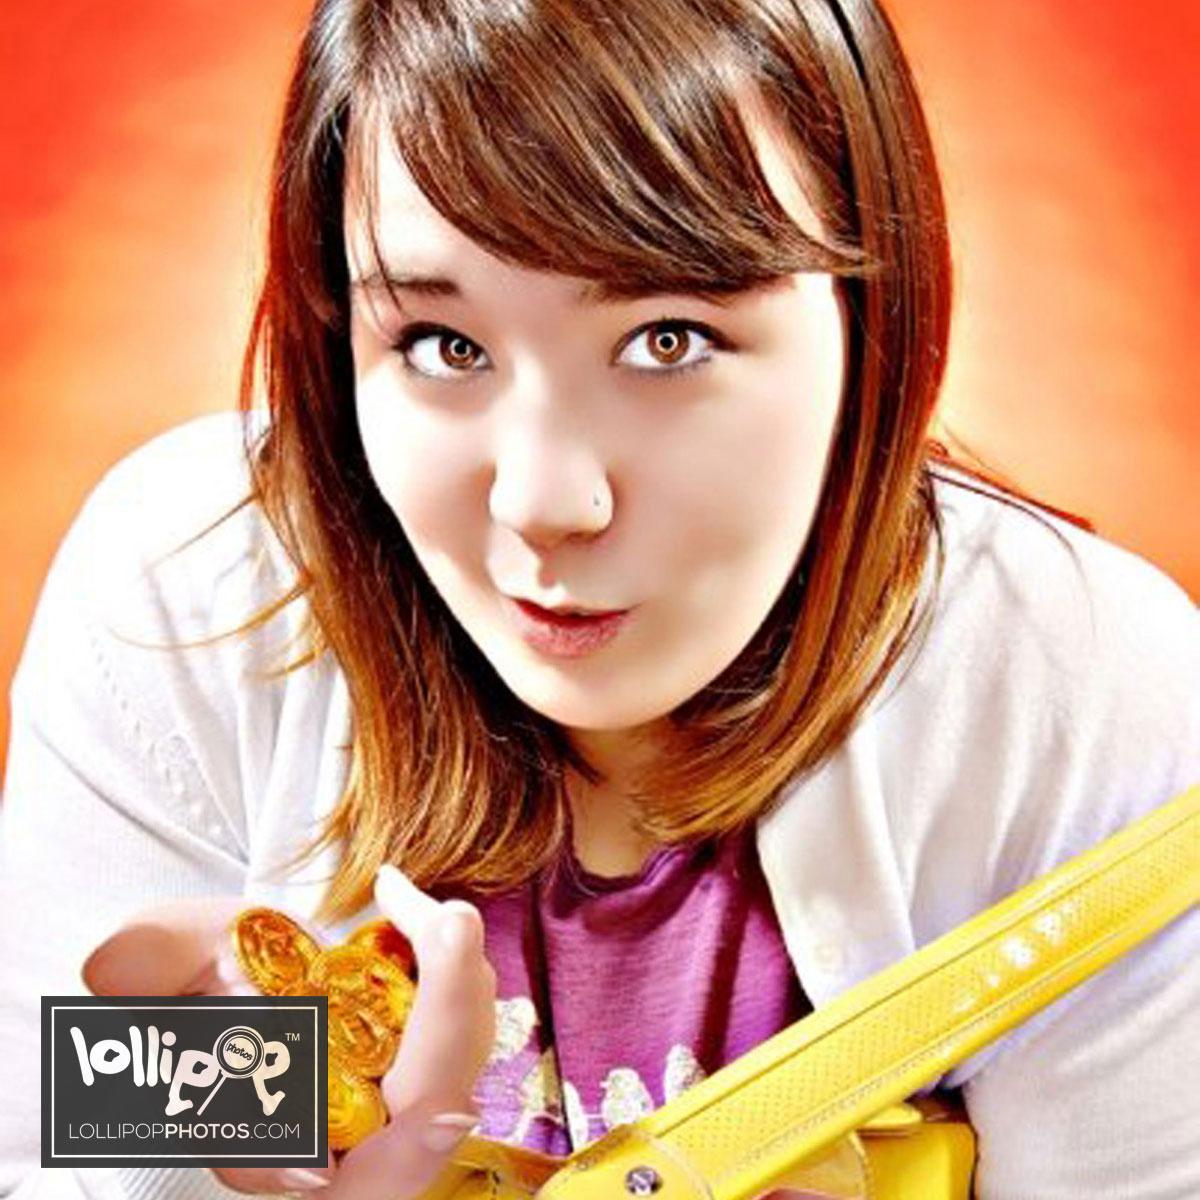 msdig-nora-canfield-lollipop-photos-122.jpg